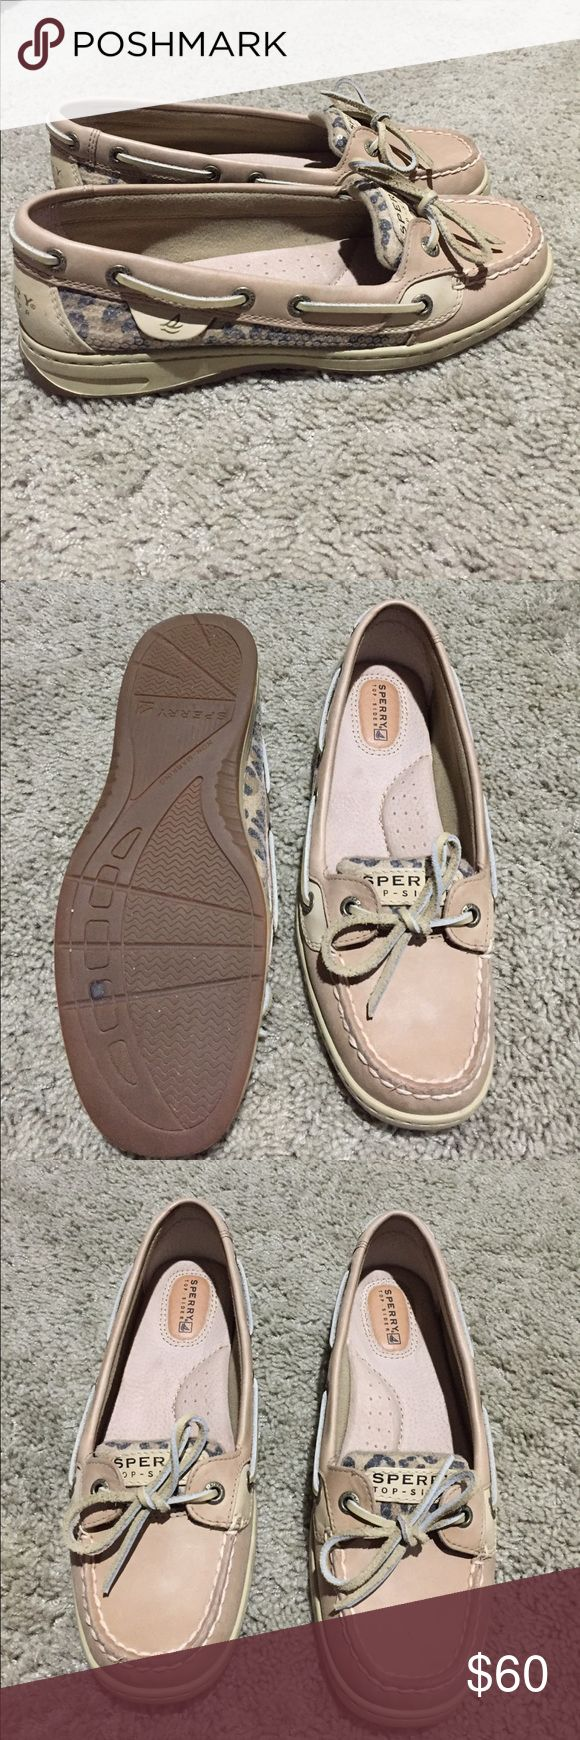 Sperry Angelfish Linen/Leopard Sequin Brand New. Never worn. Original box. Sperry Shoes Flats & Loafers